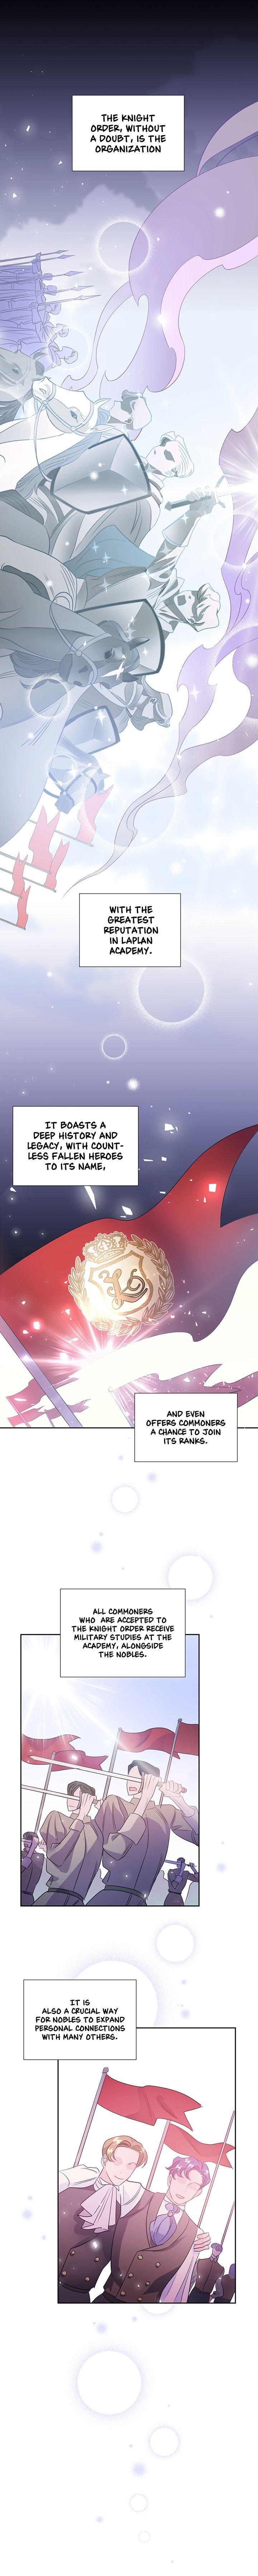 Manga The Princess' Spaceship - Chapter 18 Page 1